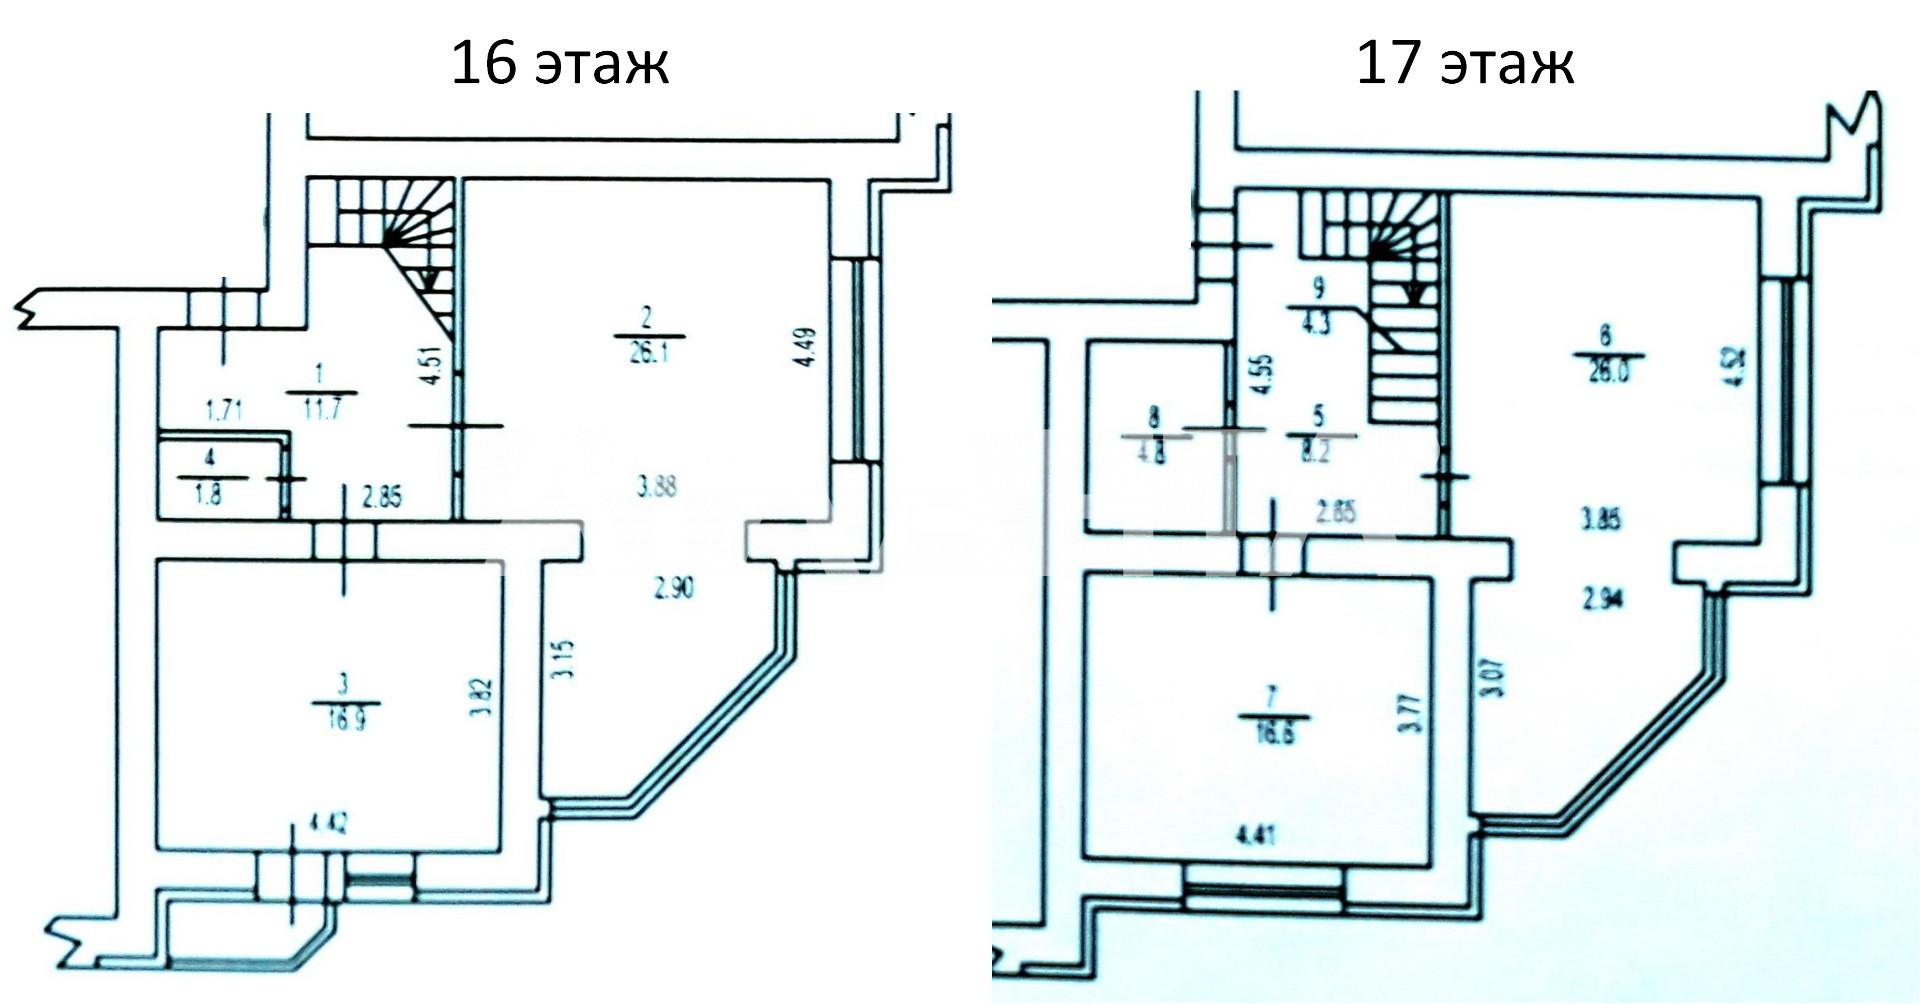 Продается 3-комнатная Квартира на ул. Ломоносова — 118 900 у.е. (фото №23)